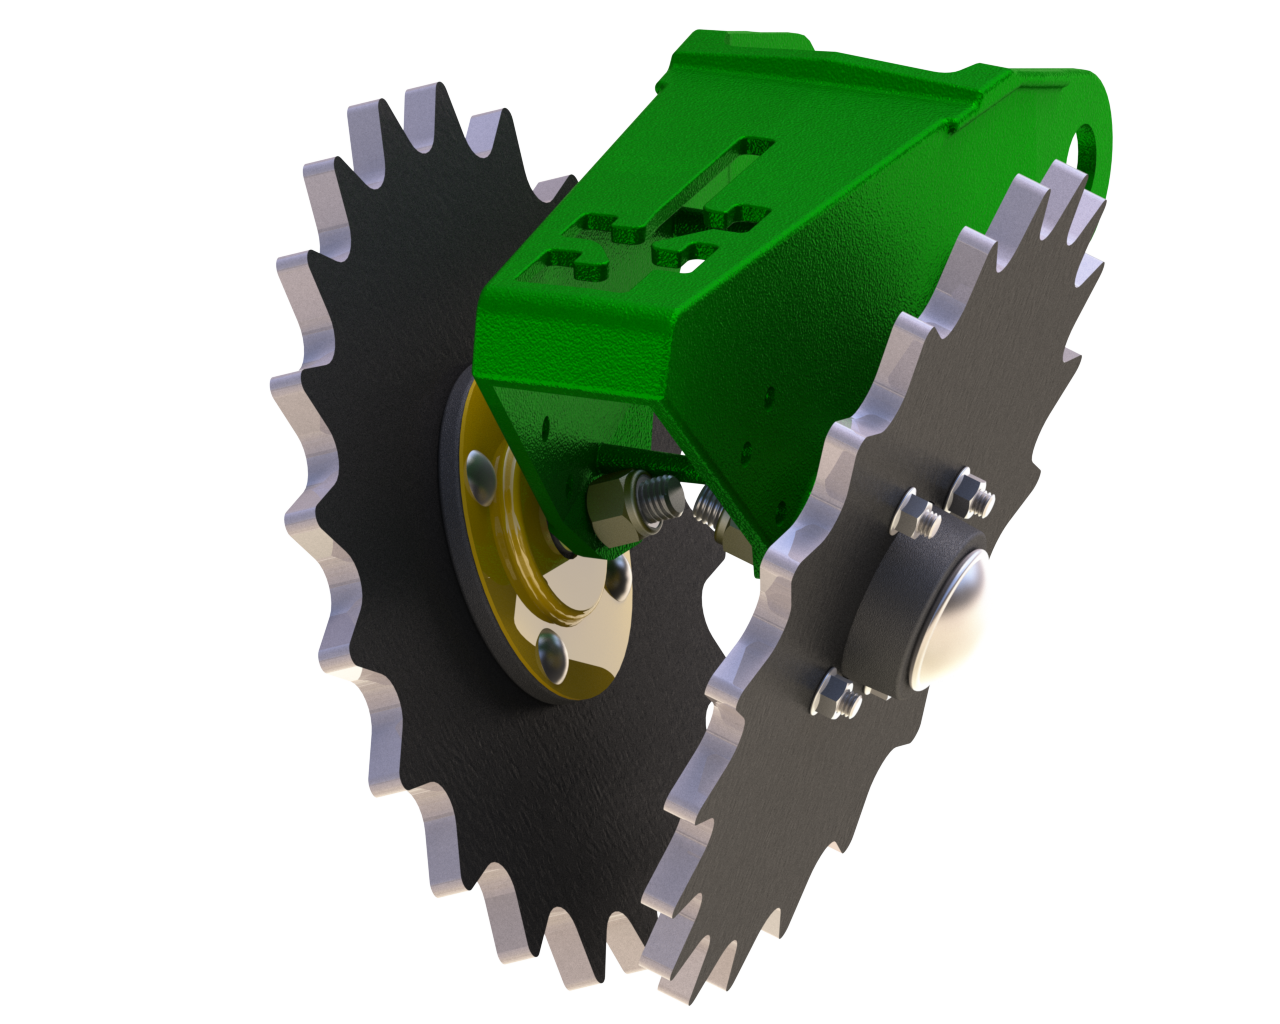 BSCW1344D, Dimple Wheels